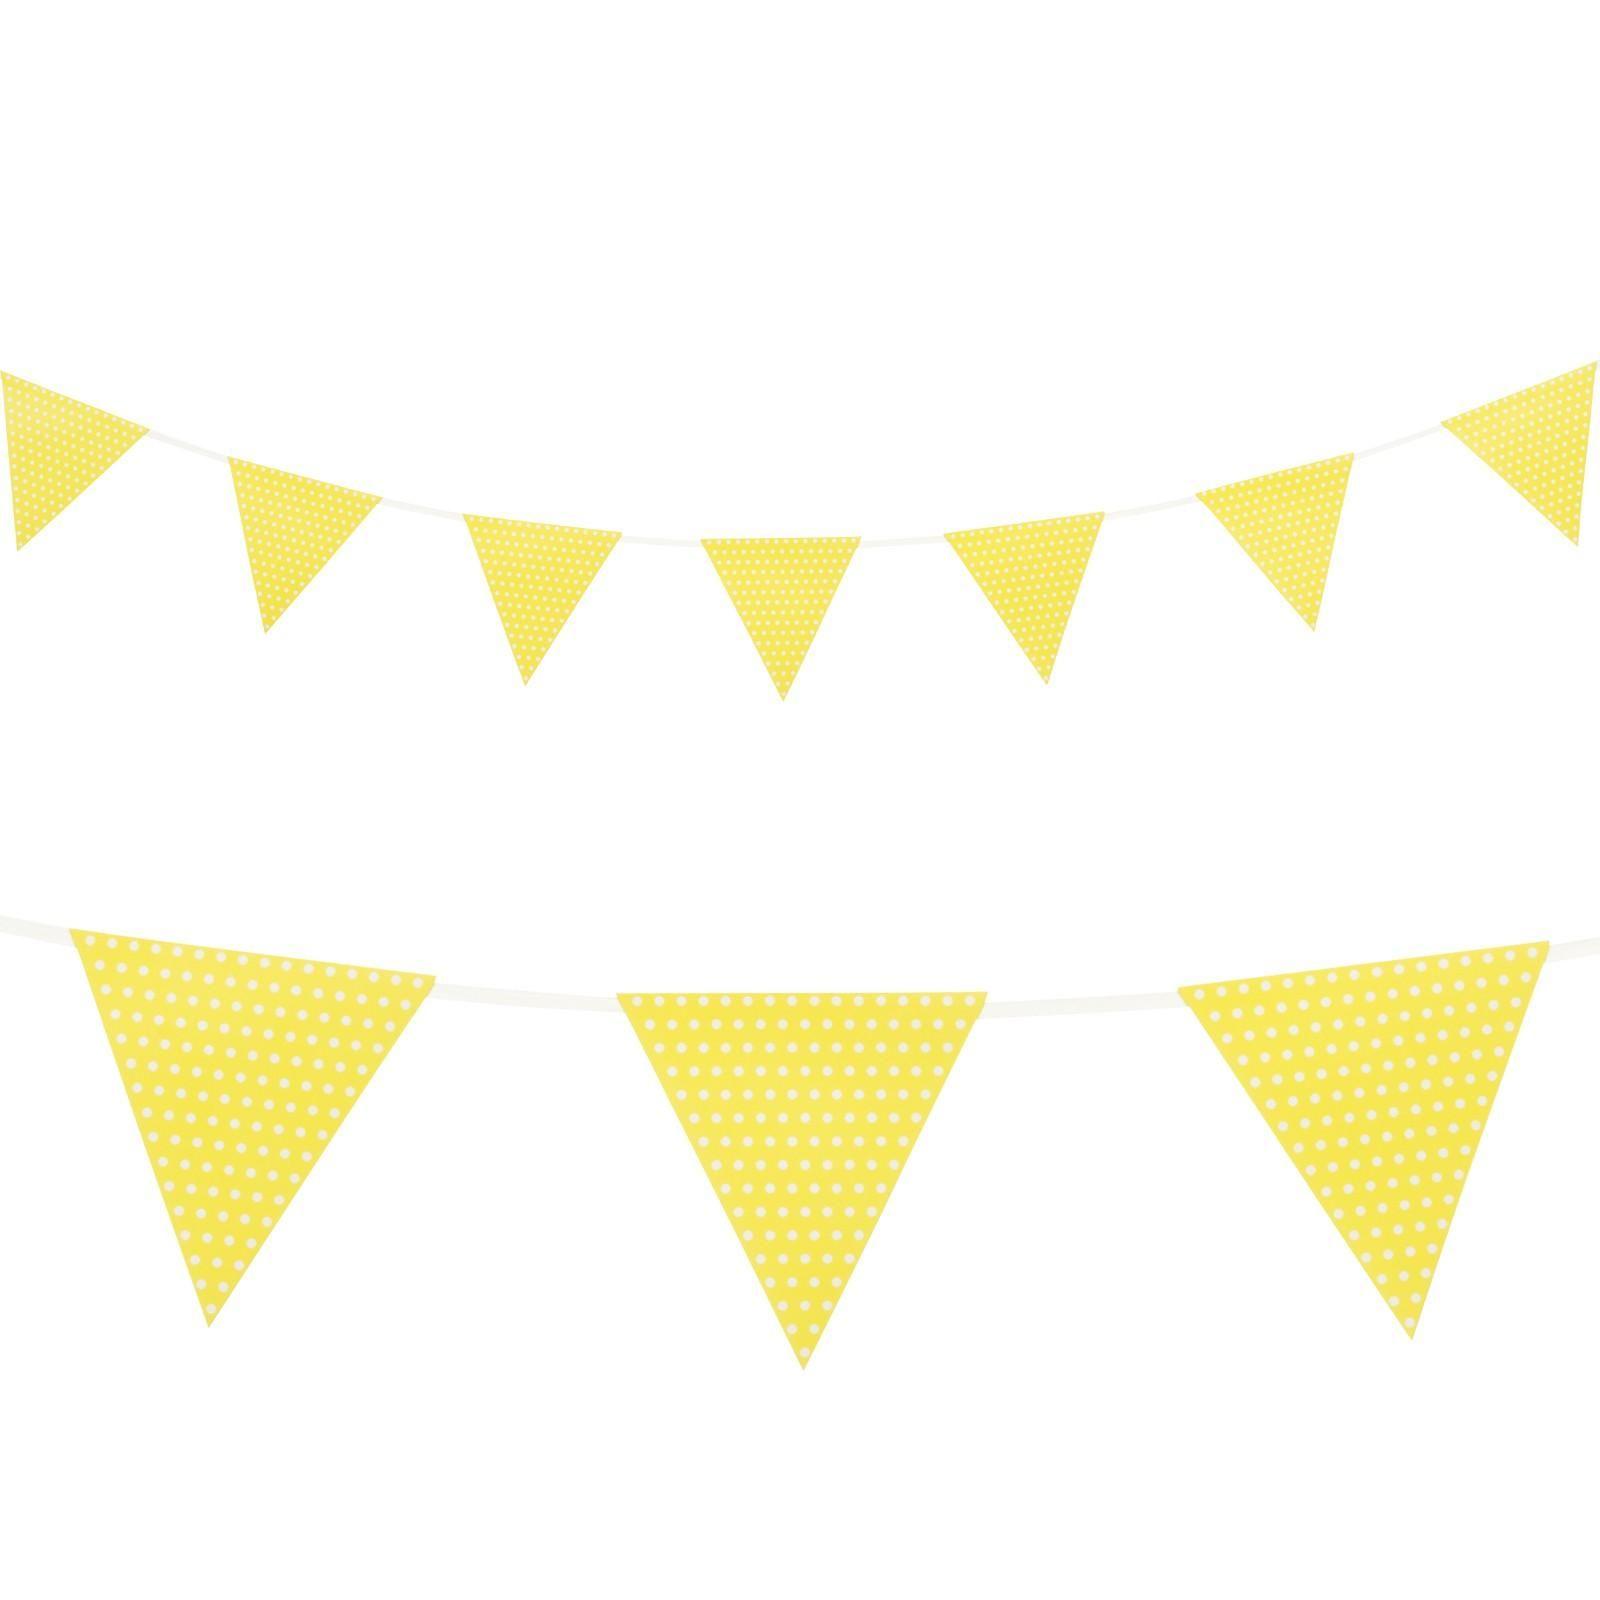 Yellow With Polka Dots Paper Flag Banner 1 Polka Dot Paper Flag Banners Banner